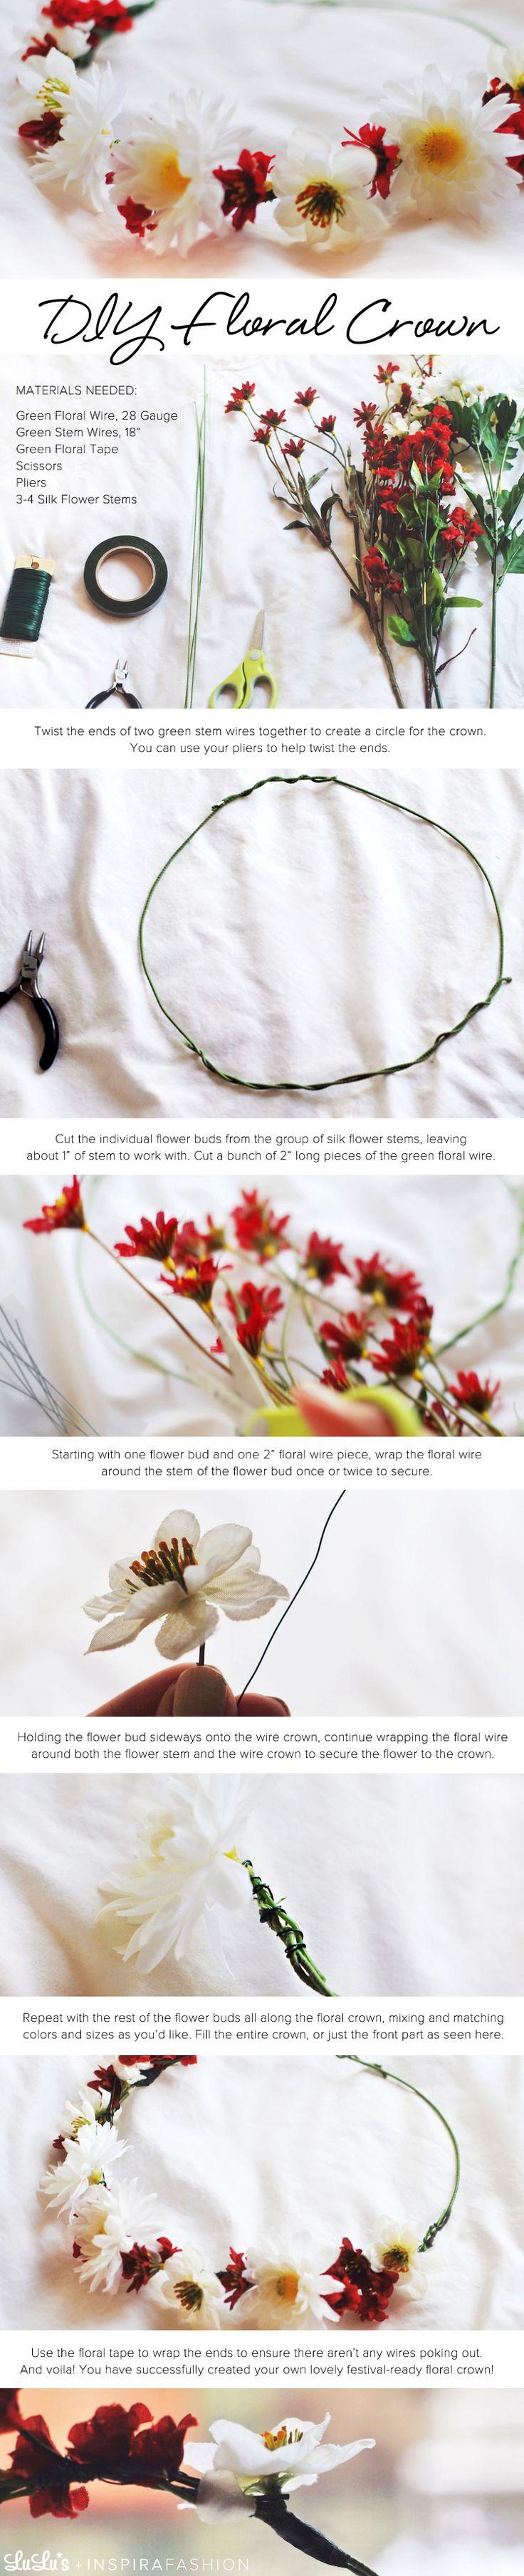 DIY Flower Crown Tutorial #festival #diy